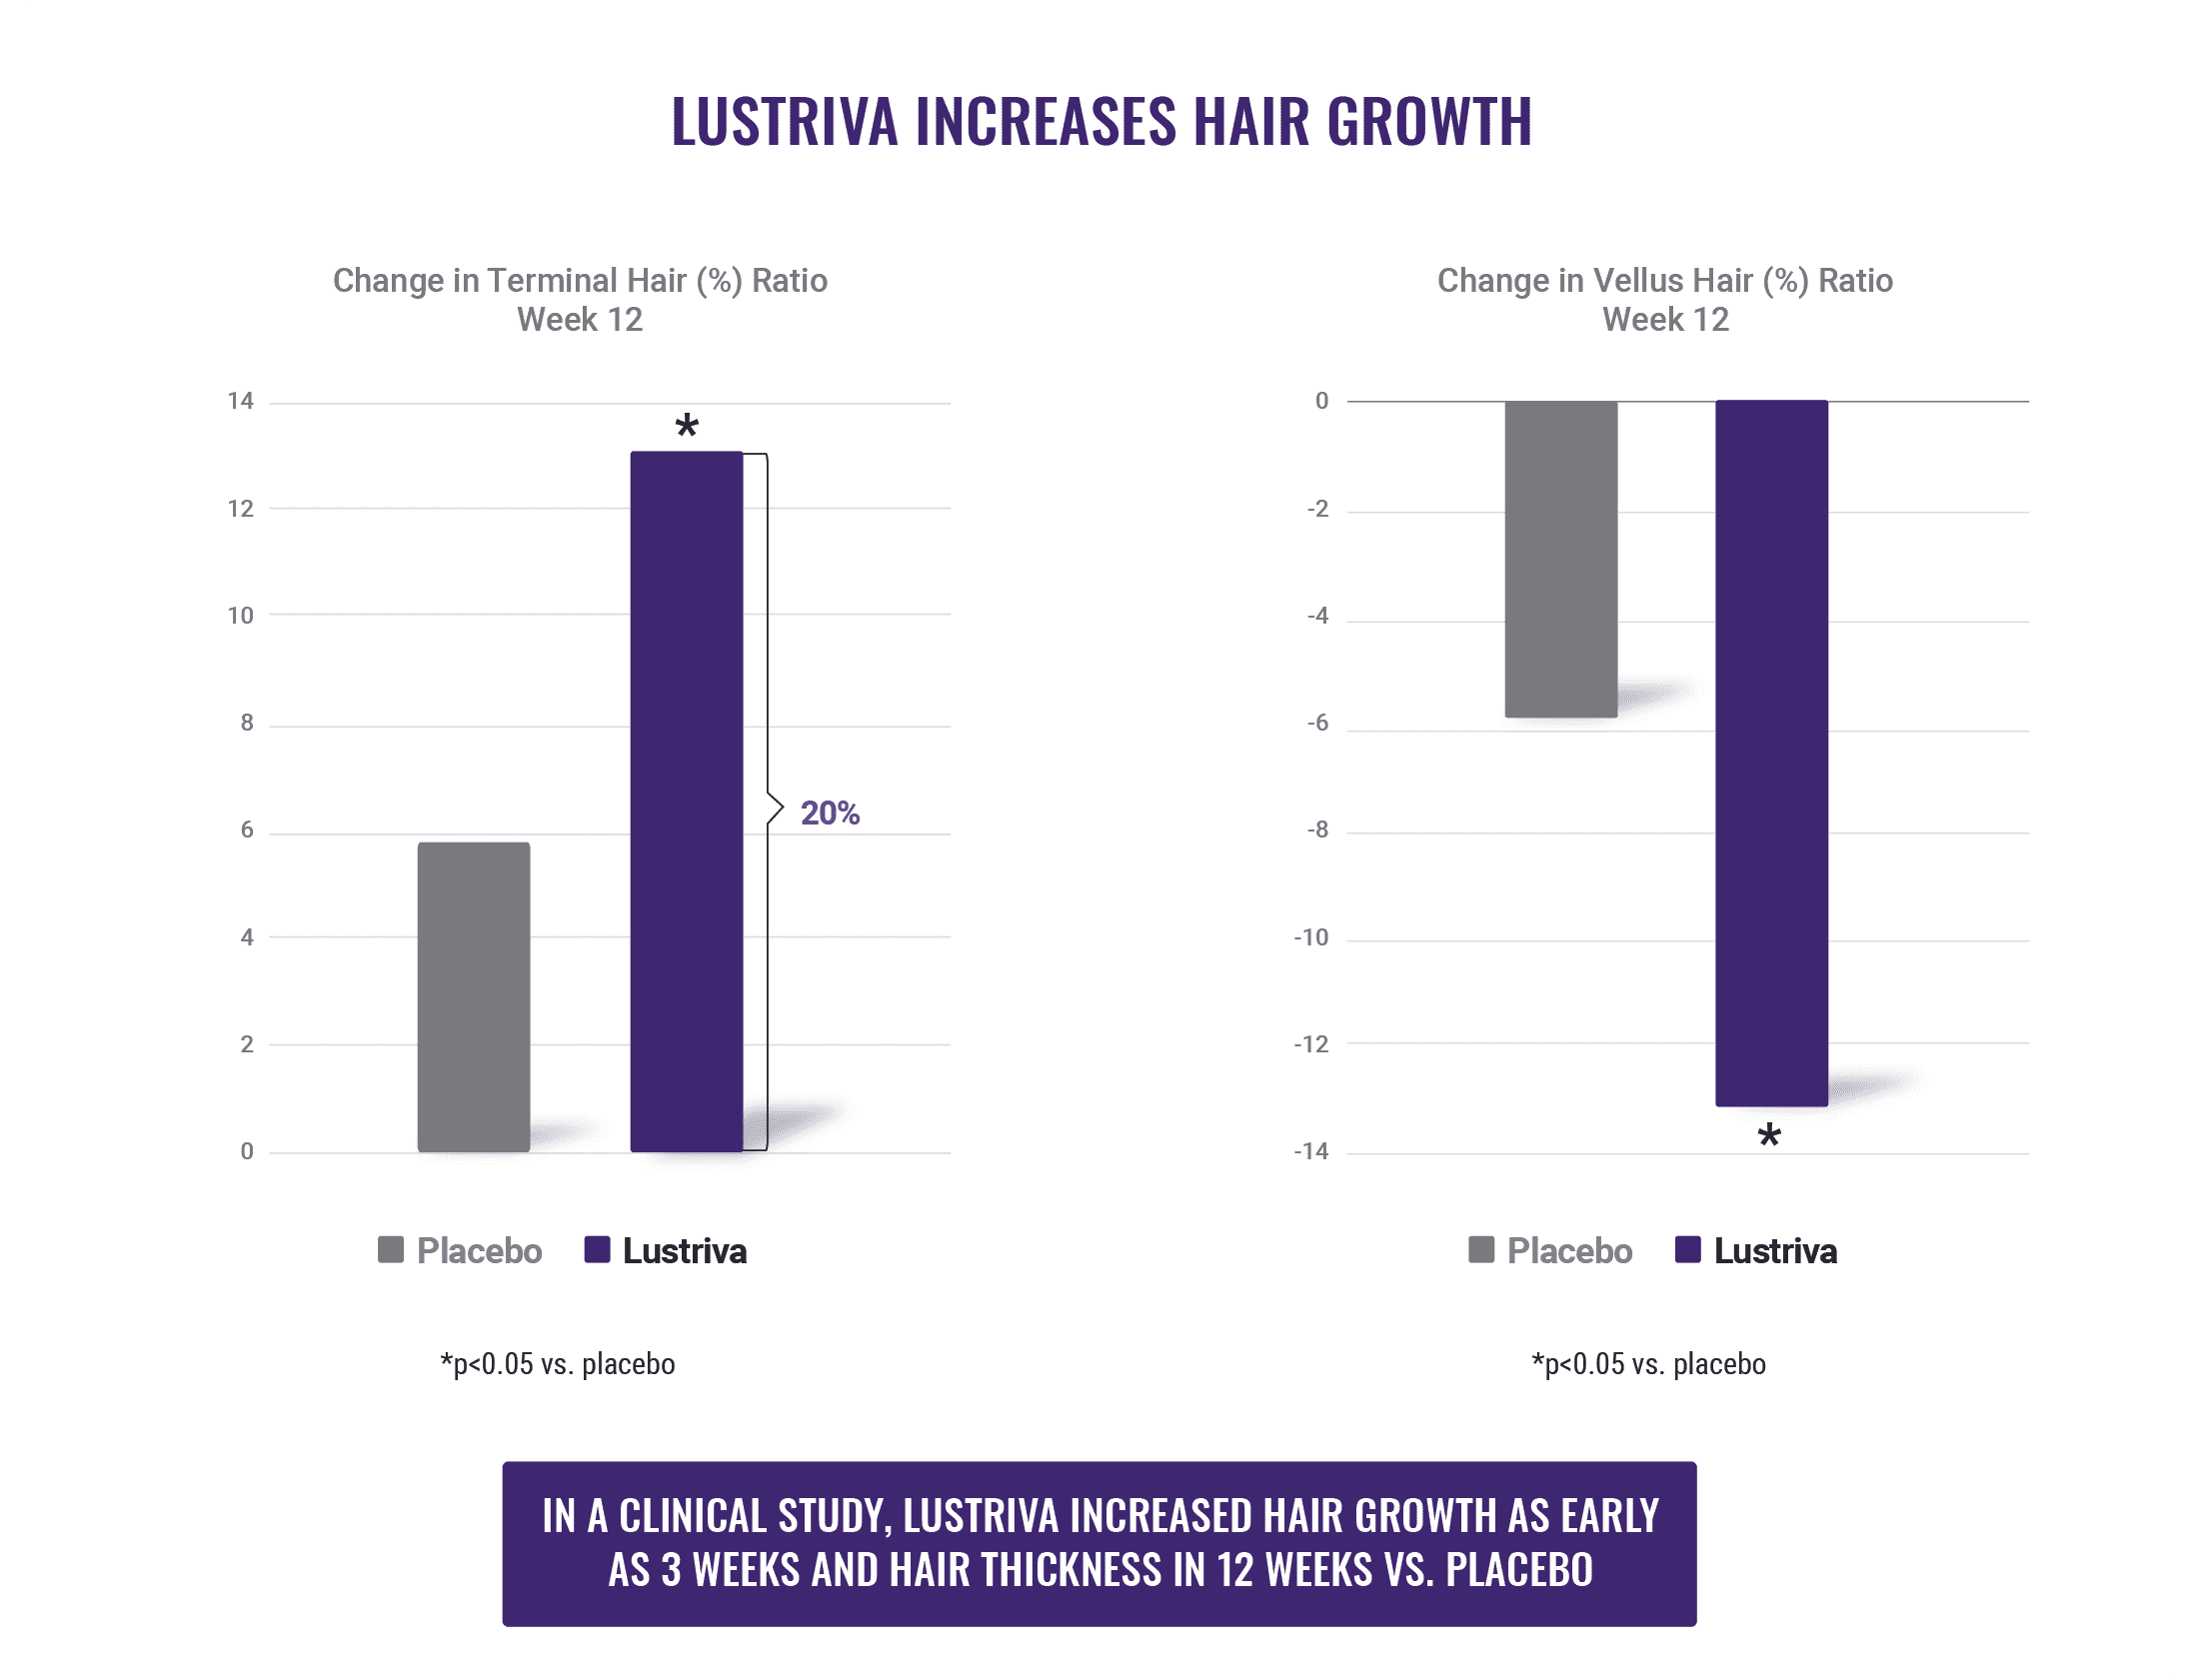 Lustriva IncreasesHairGrowth 1 Nutrition21